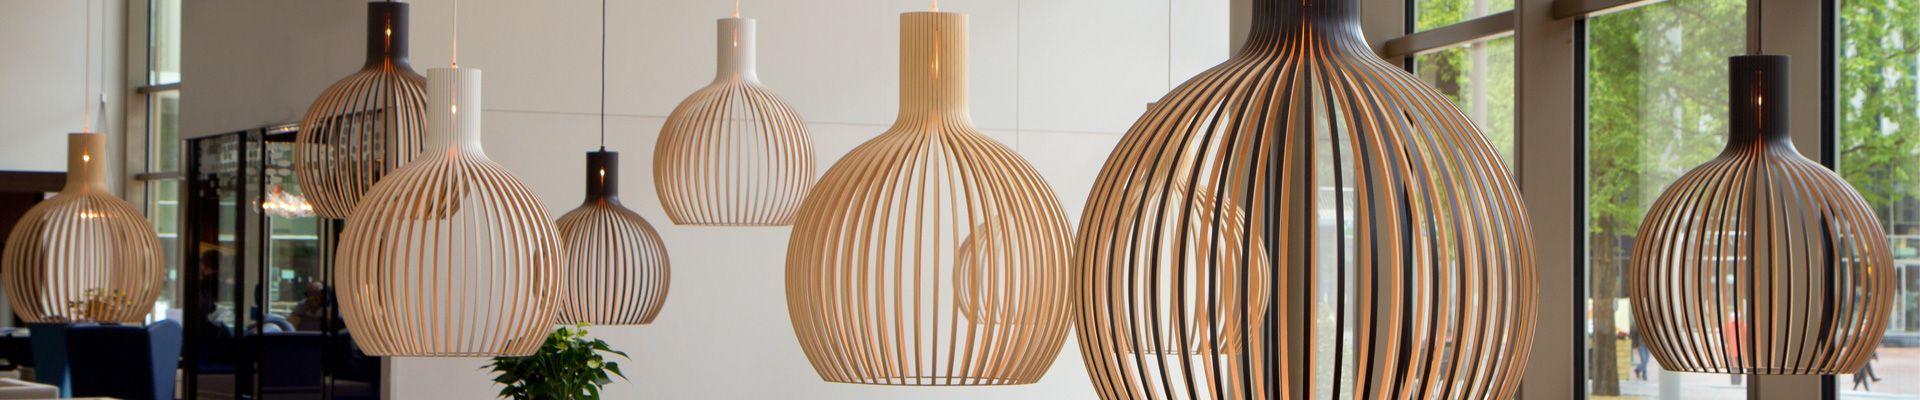 Mooie verlichting maison belle interieuradvies for Led hanglampen woonkamer